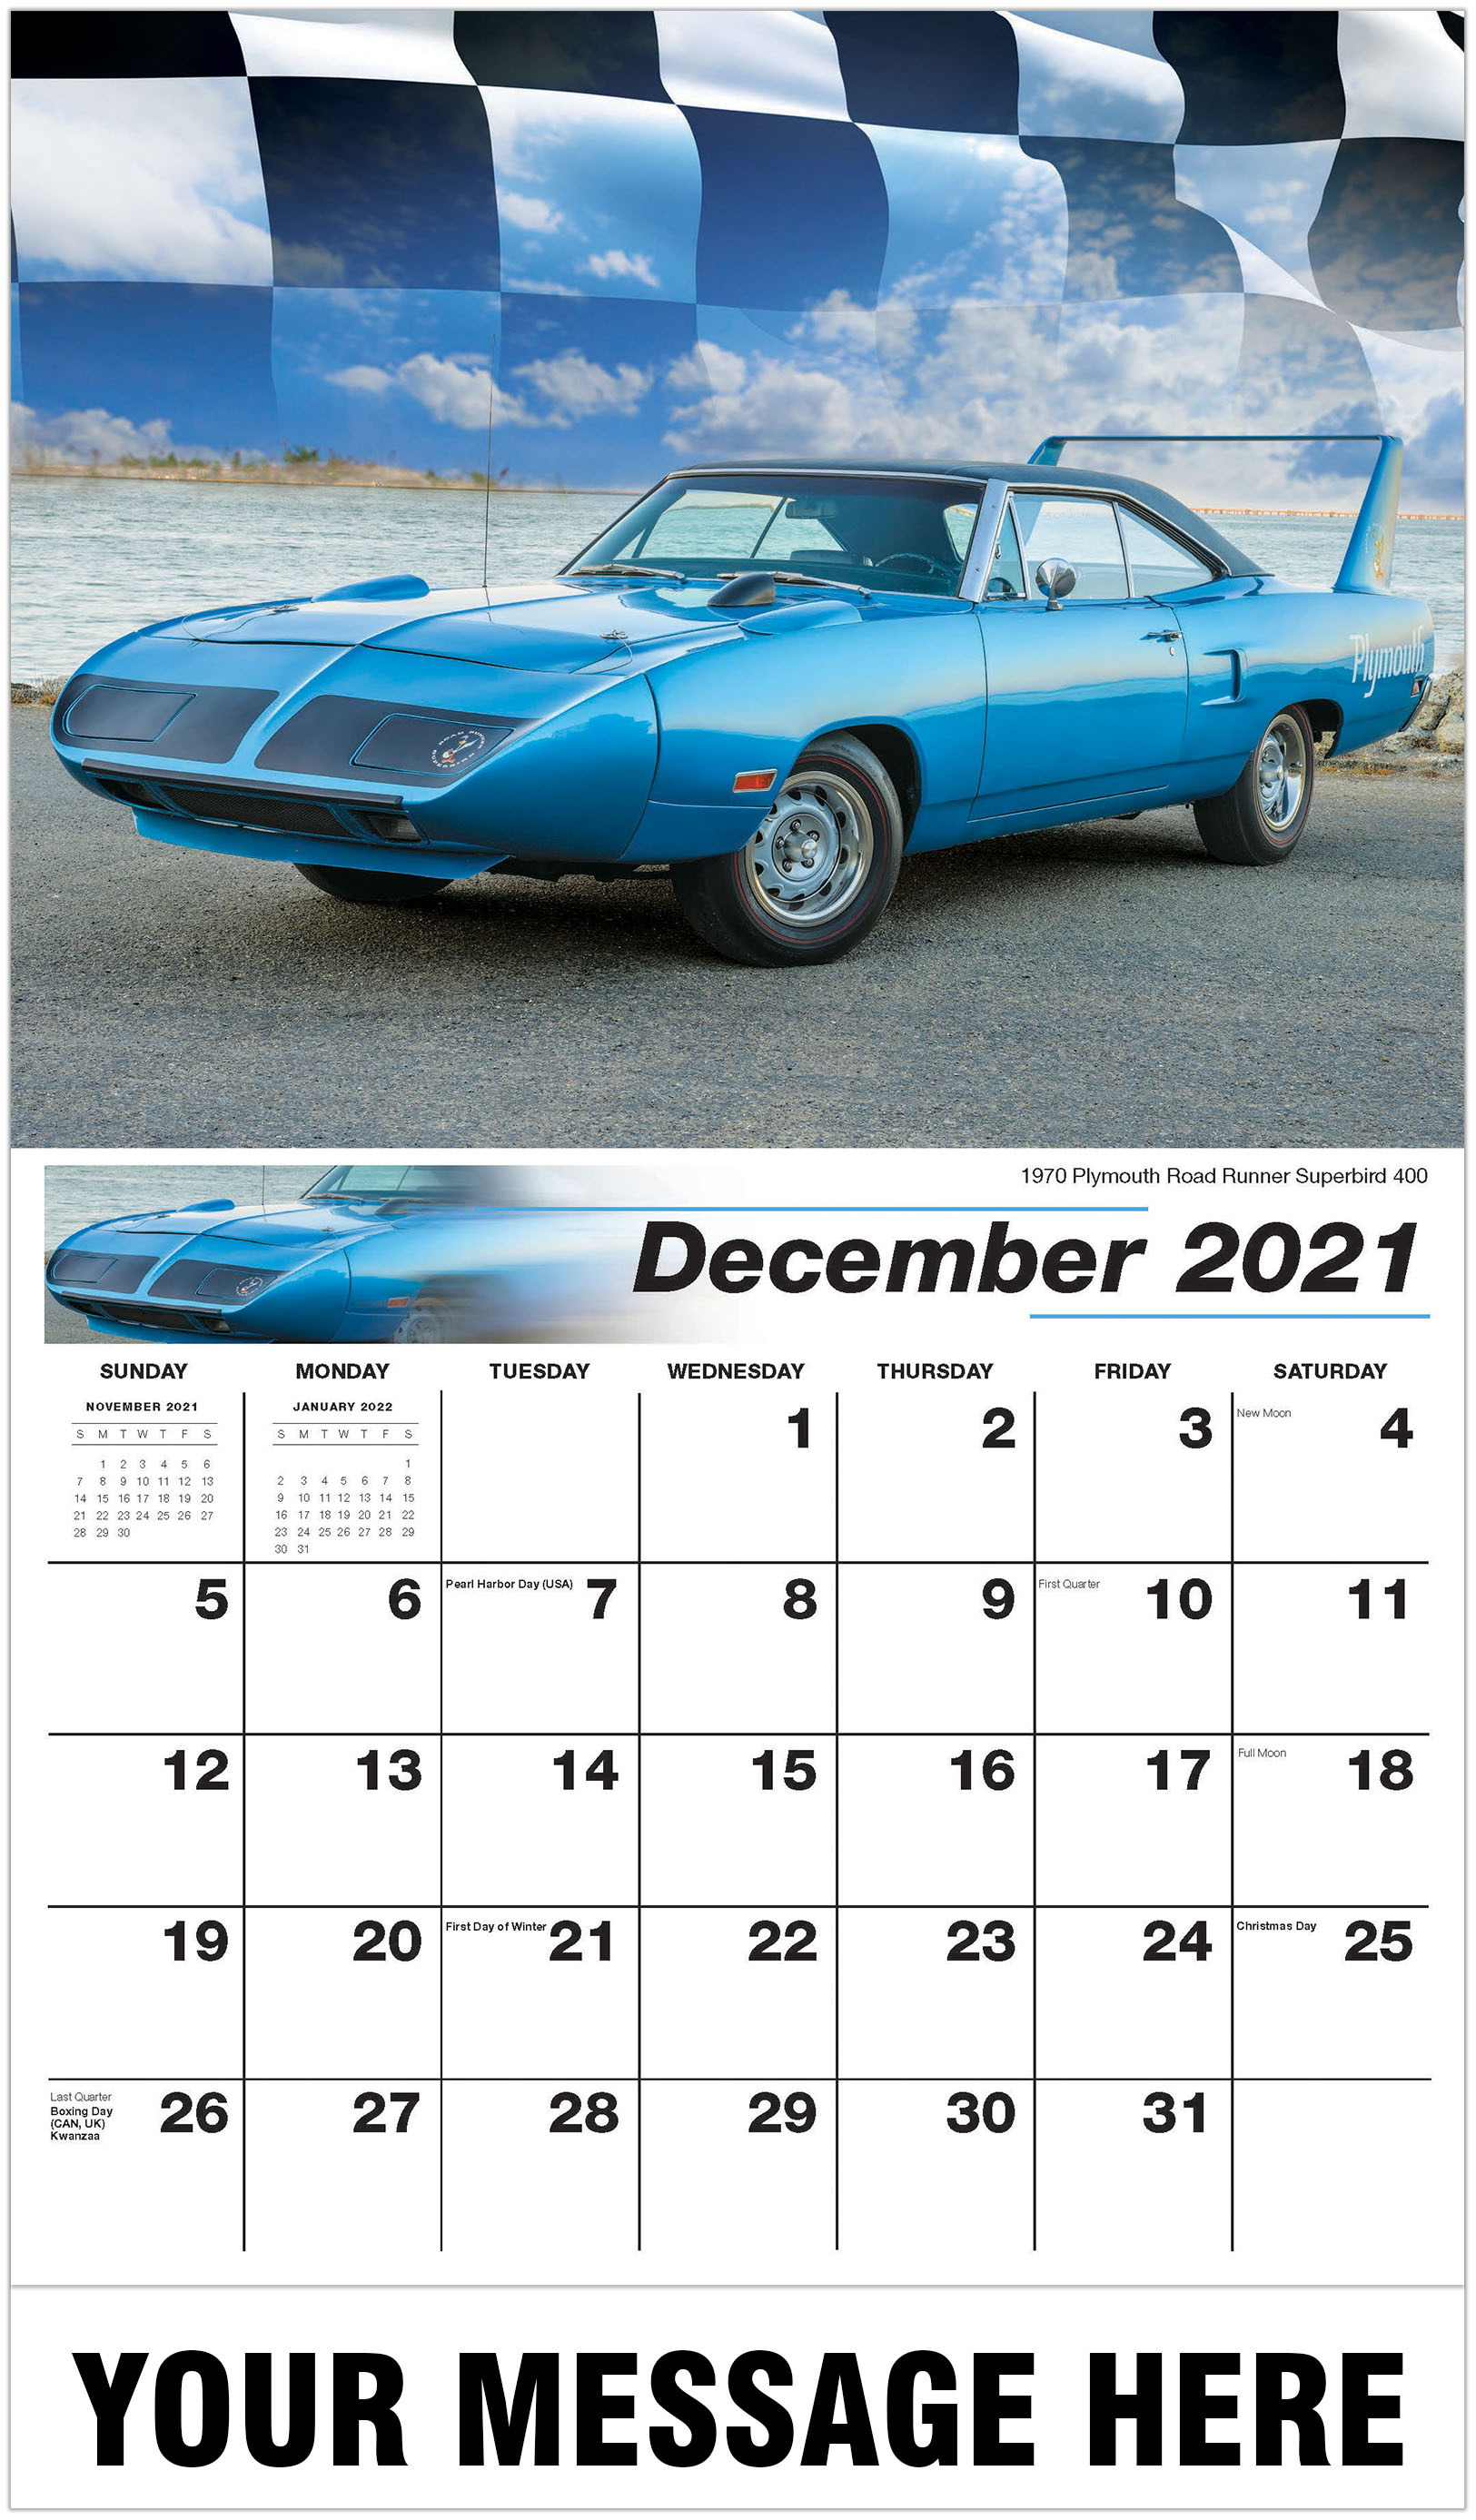 Hot Rods - Muscle Cars Calendar | 2021 Business Promo Calendar